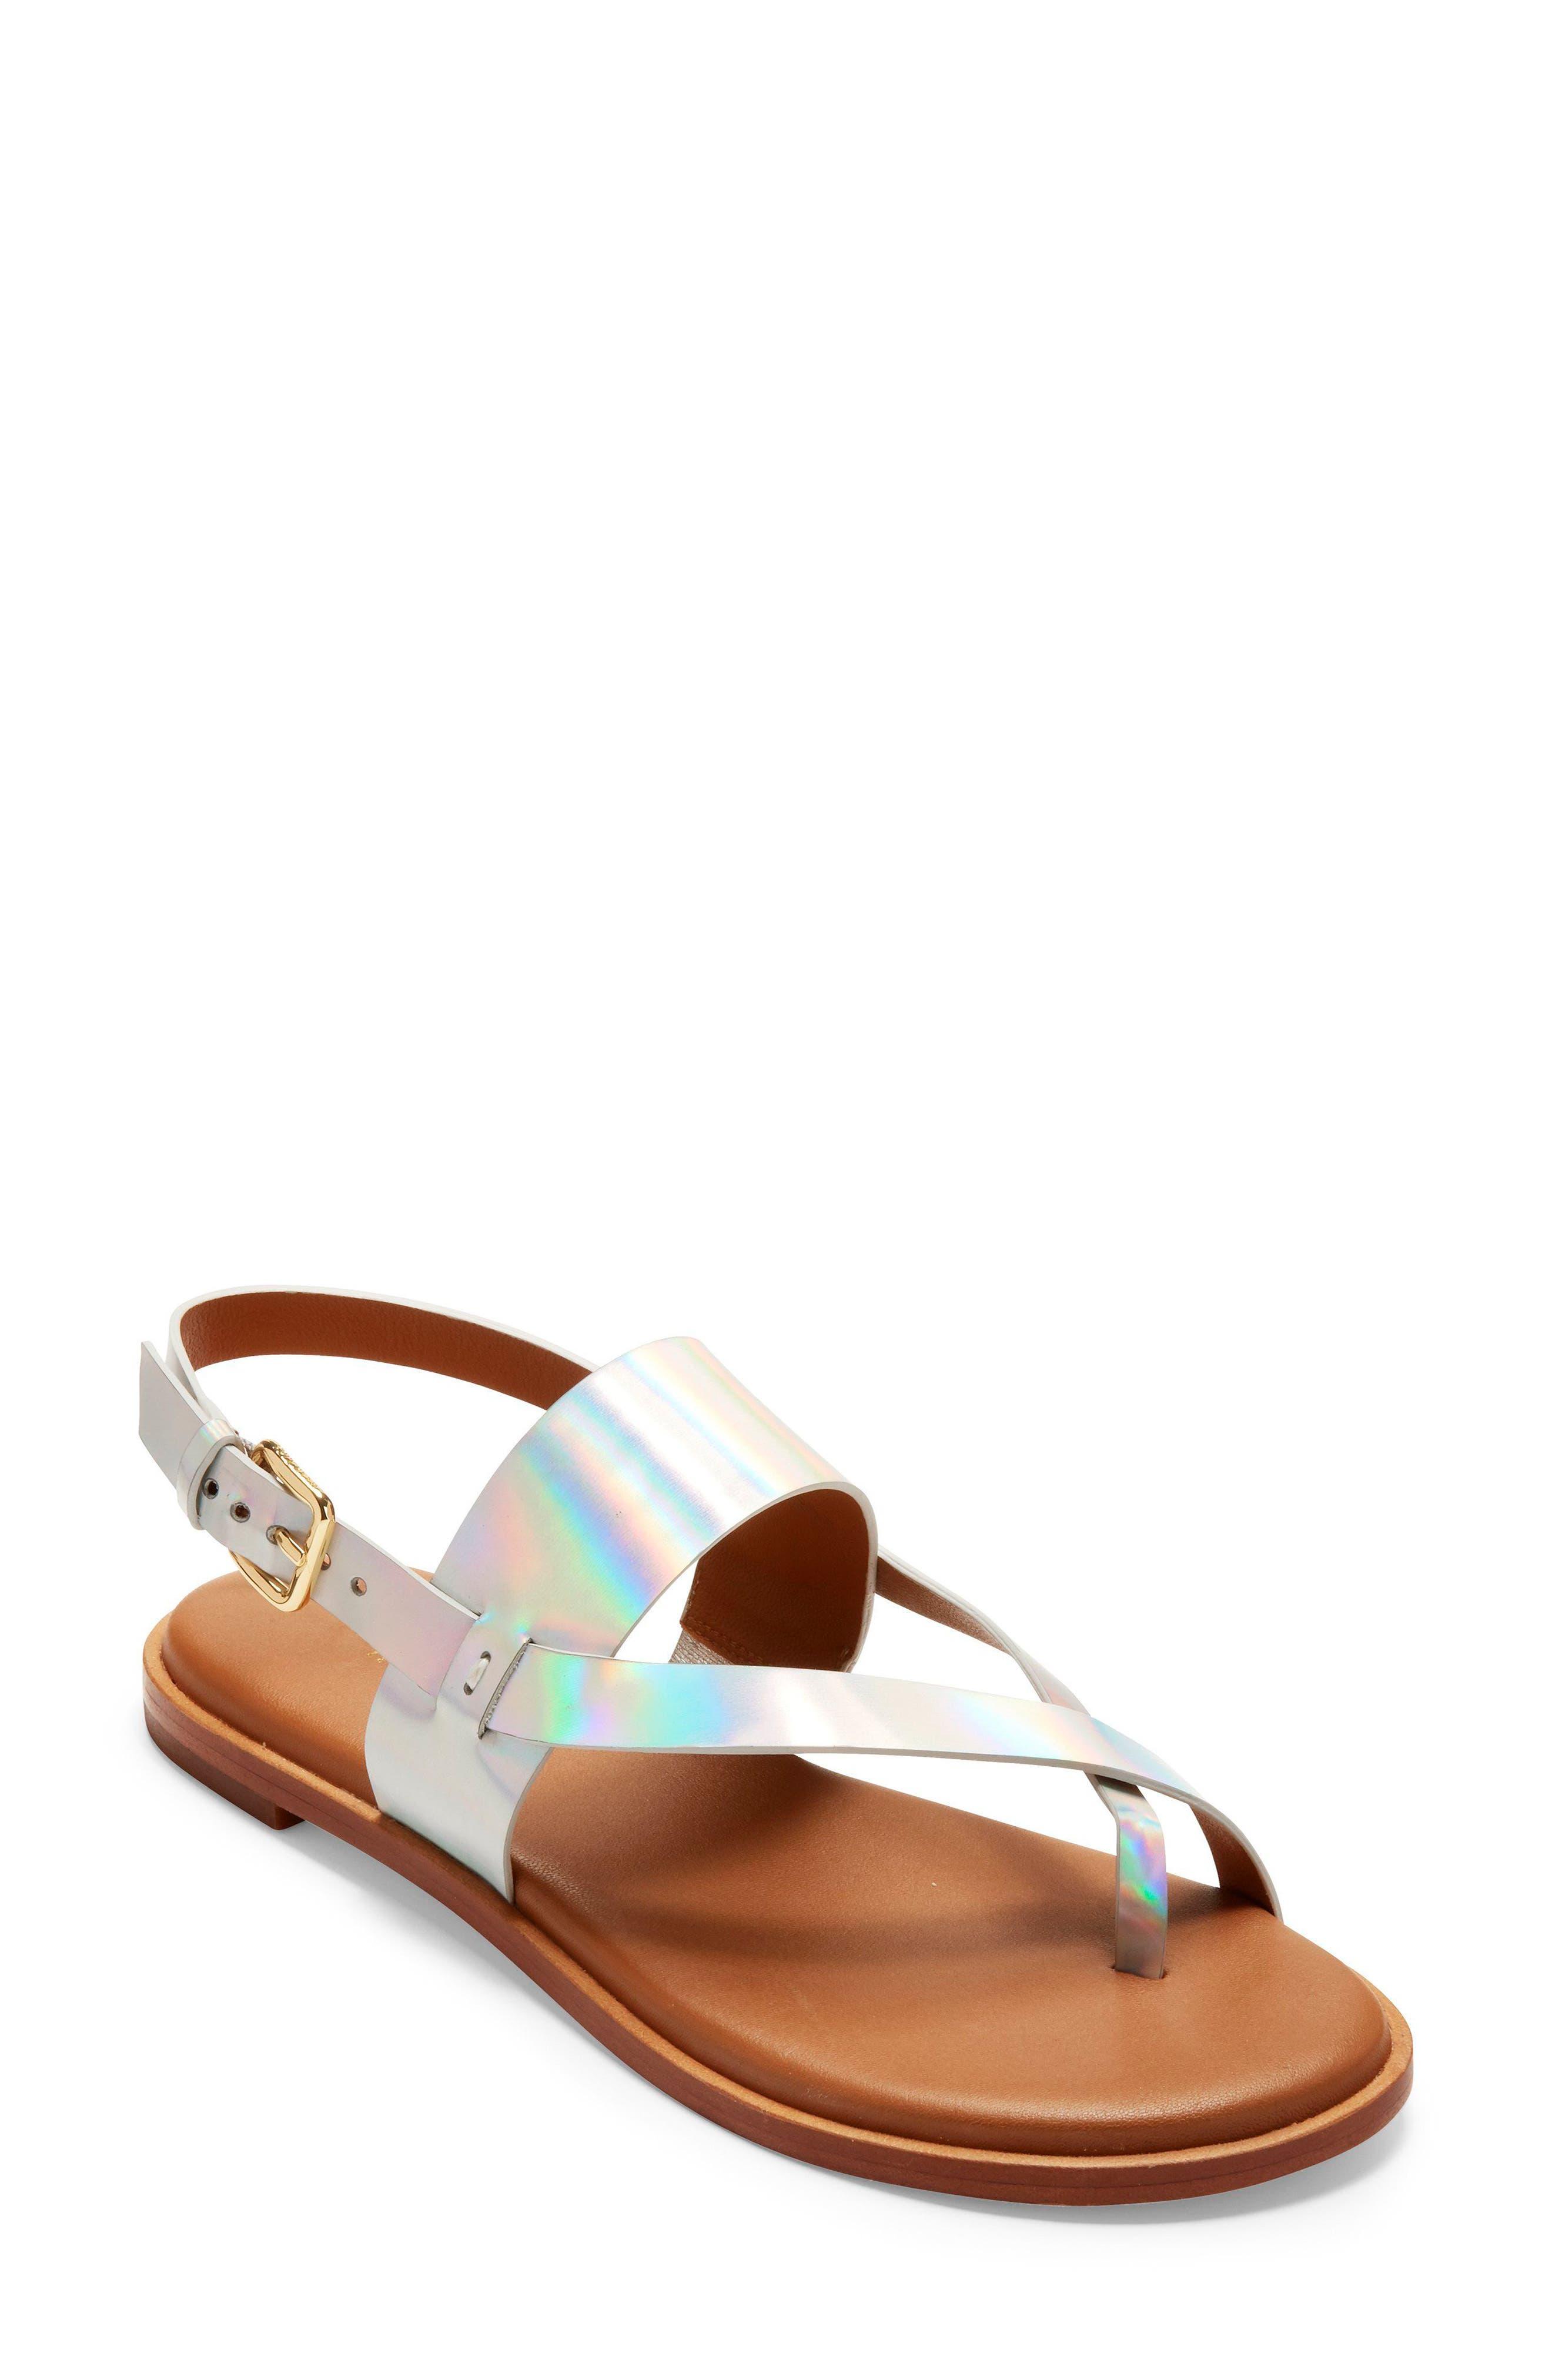 Anica Sandal,                             Main thumbnail 1, color,                             Iridescent Leather